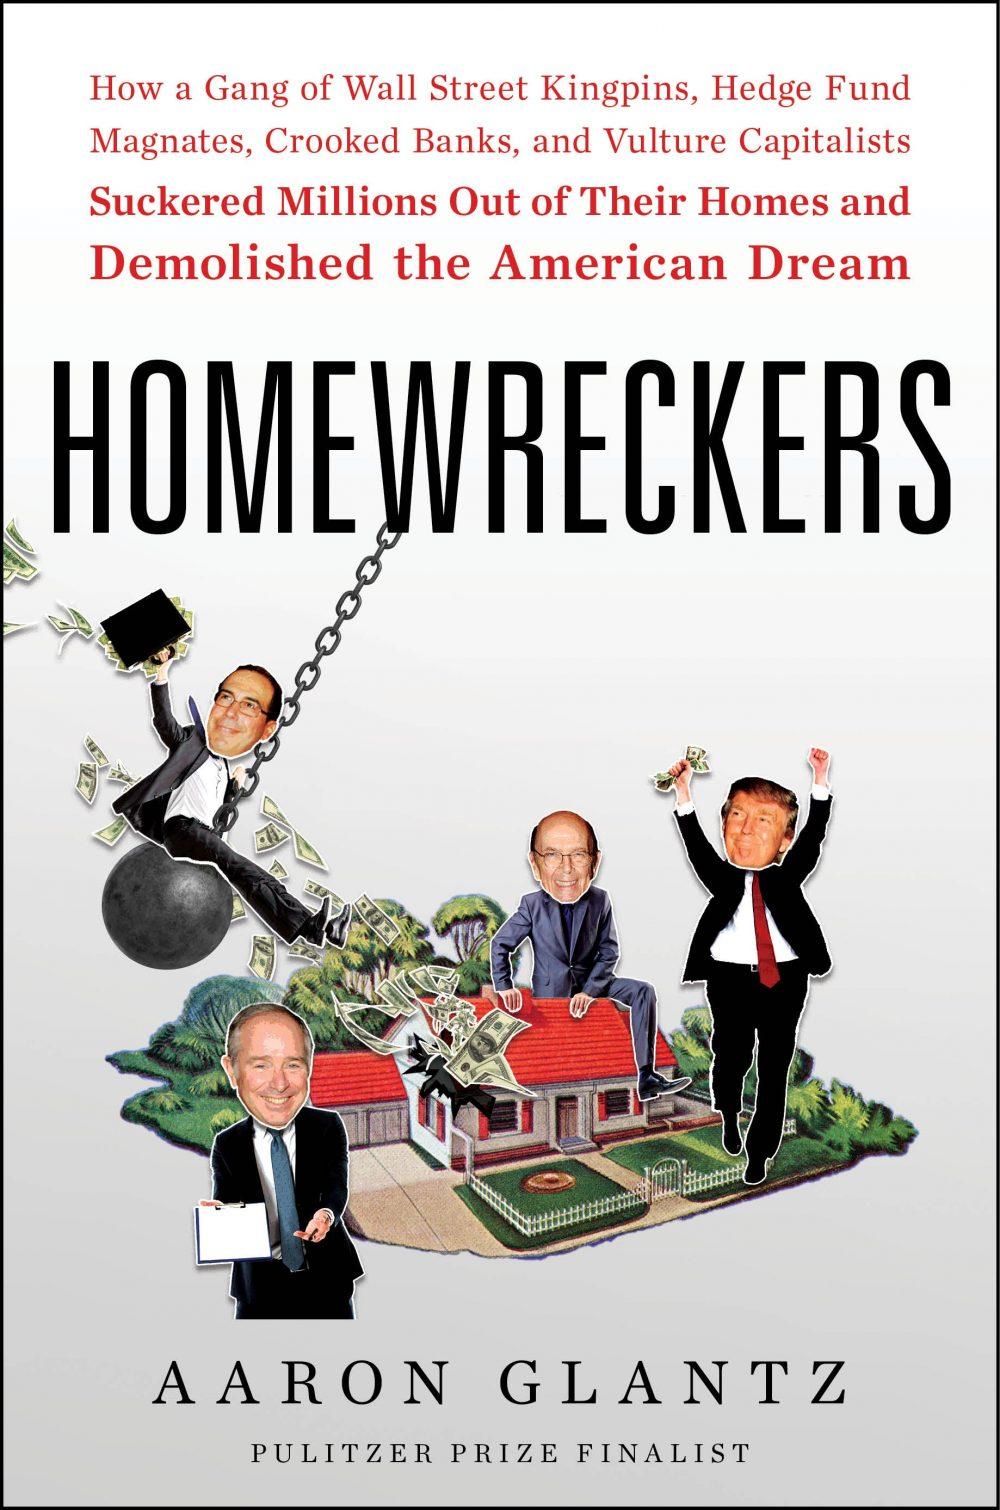 homewreckers book